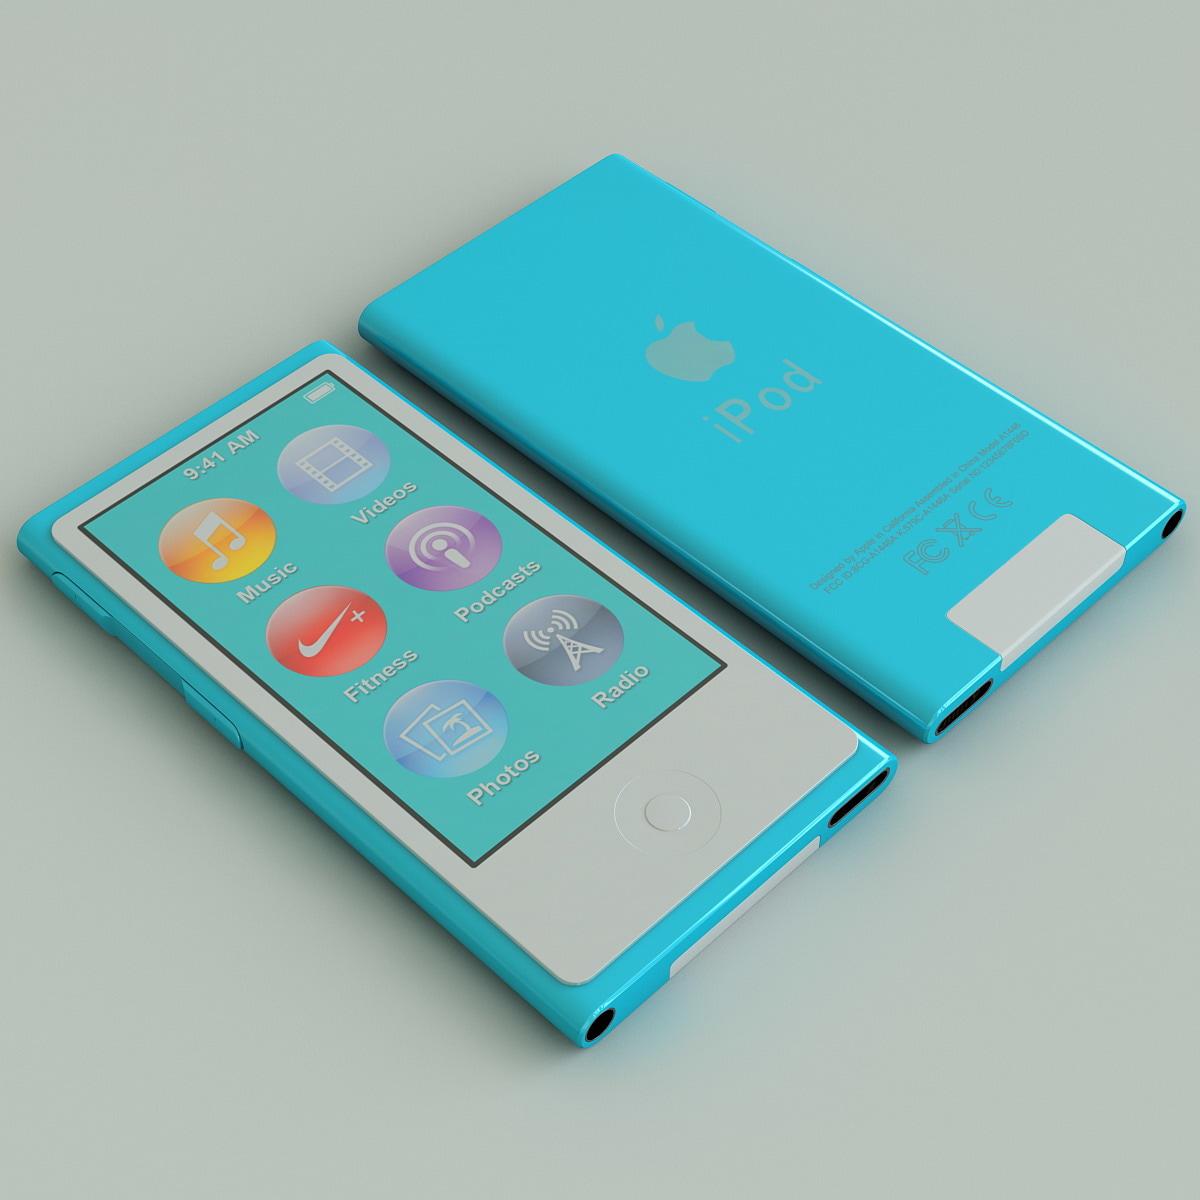 Ipod_Nano_Generation_7th_Blue_004.jpg